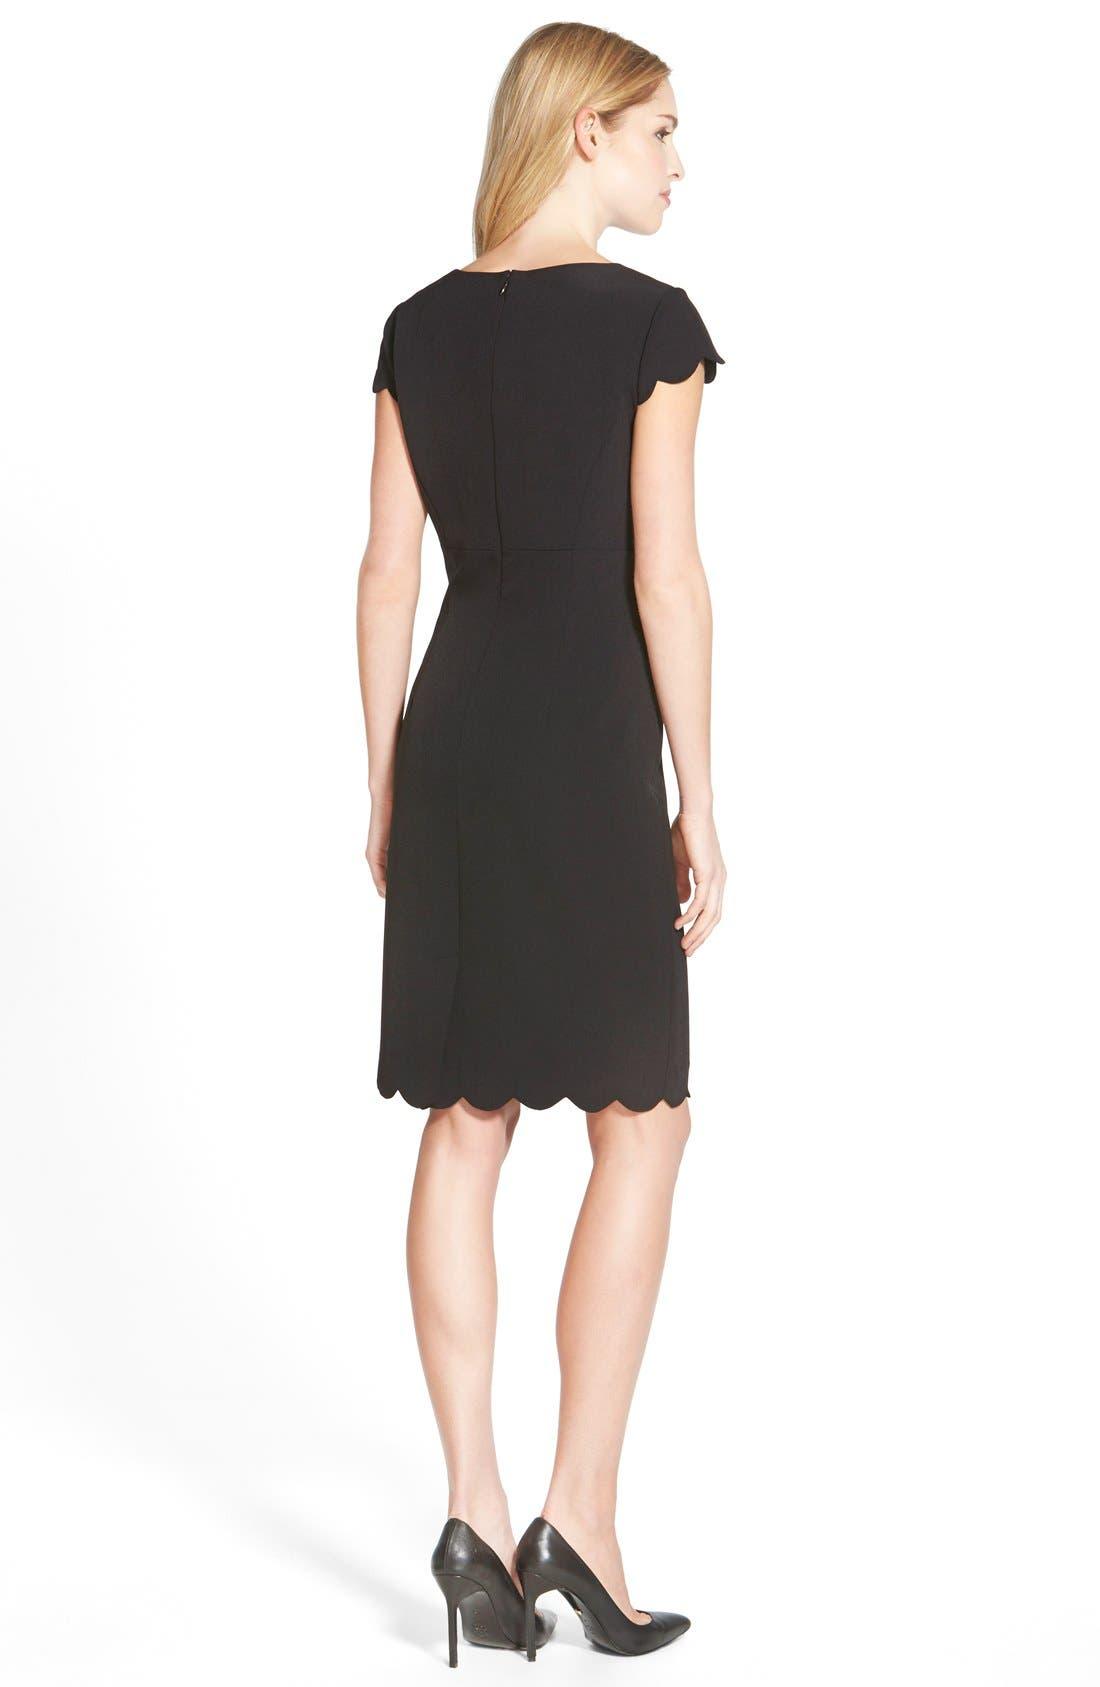 ADRIANNA PAPELL,                             Scalloped Crepe Sheath Dress,                             Alternate thumbnail 10, color,                             001